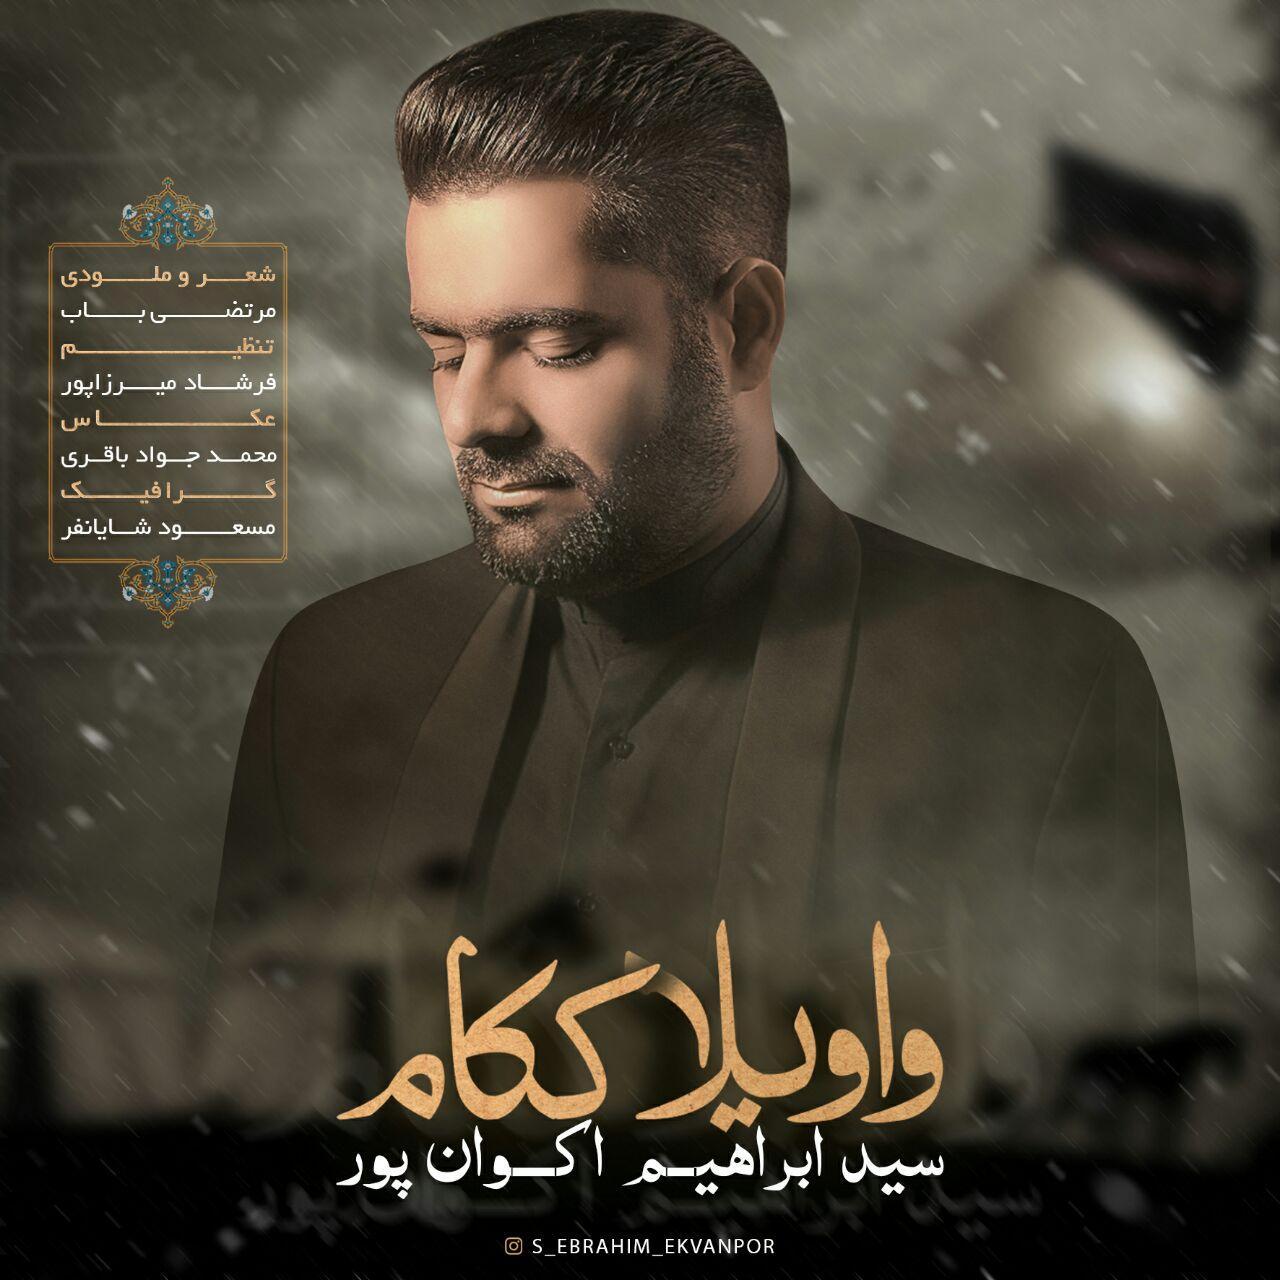 واویلا ککام سید ابراهیم اکوان پور